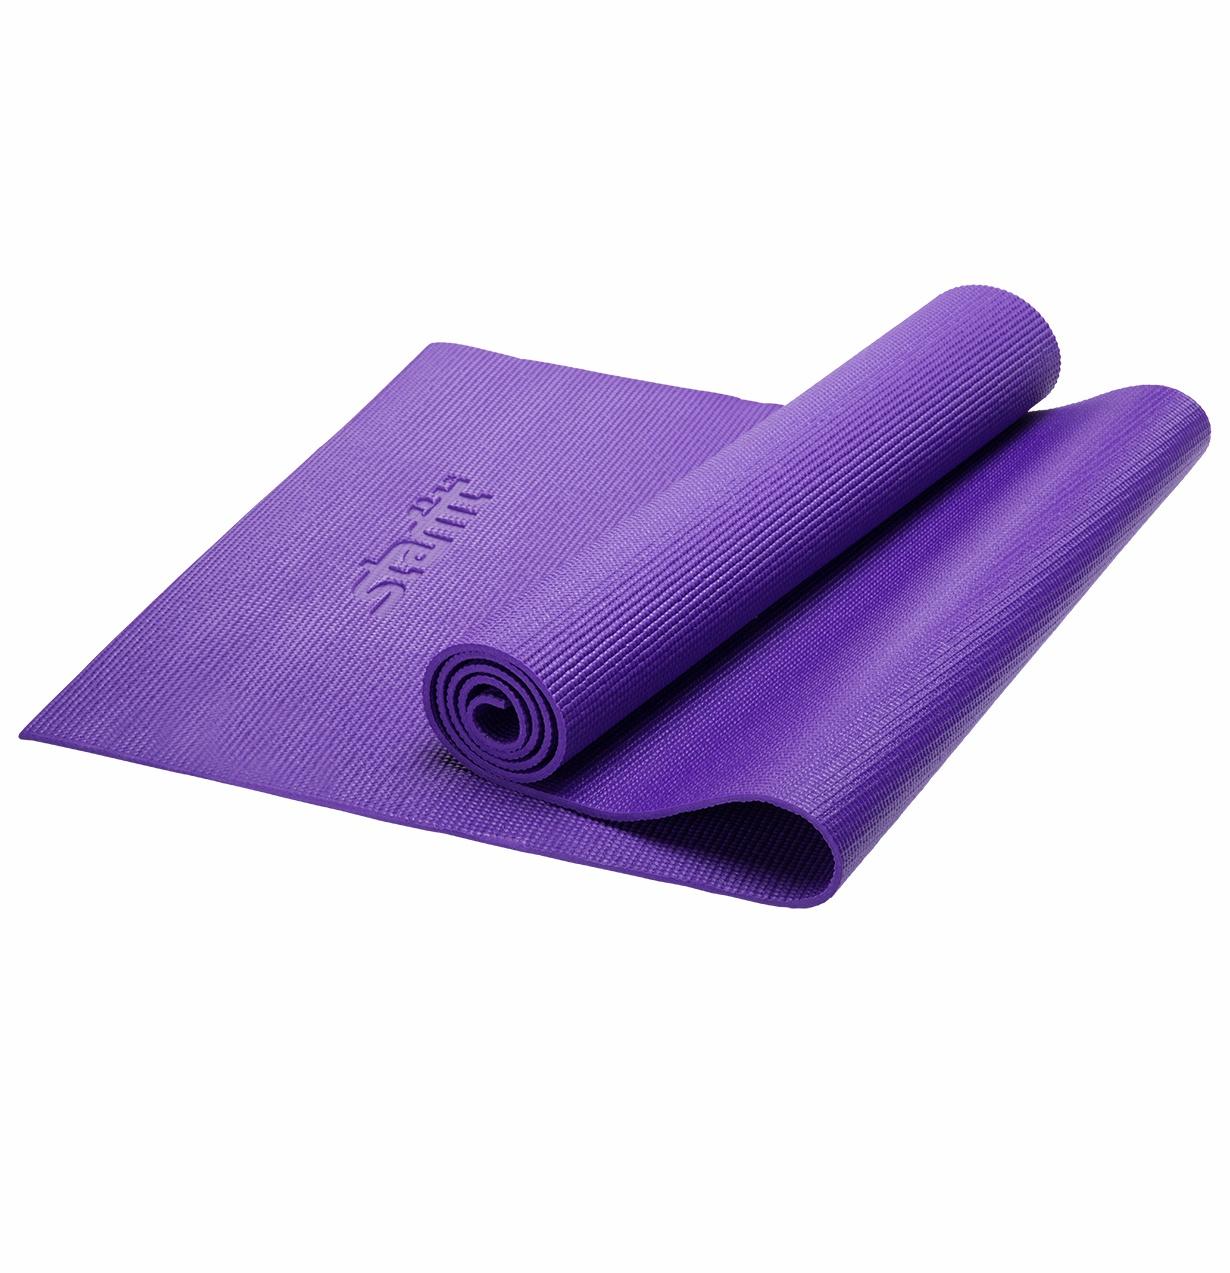 Коврик для йоги Starfit FM-101, 173x61 см, фиолетовый цена